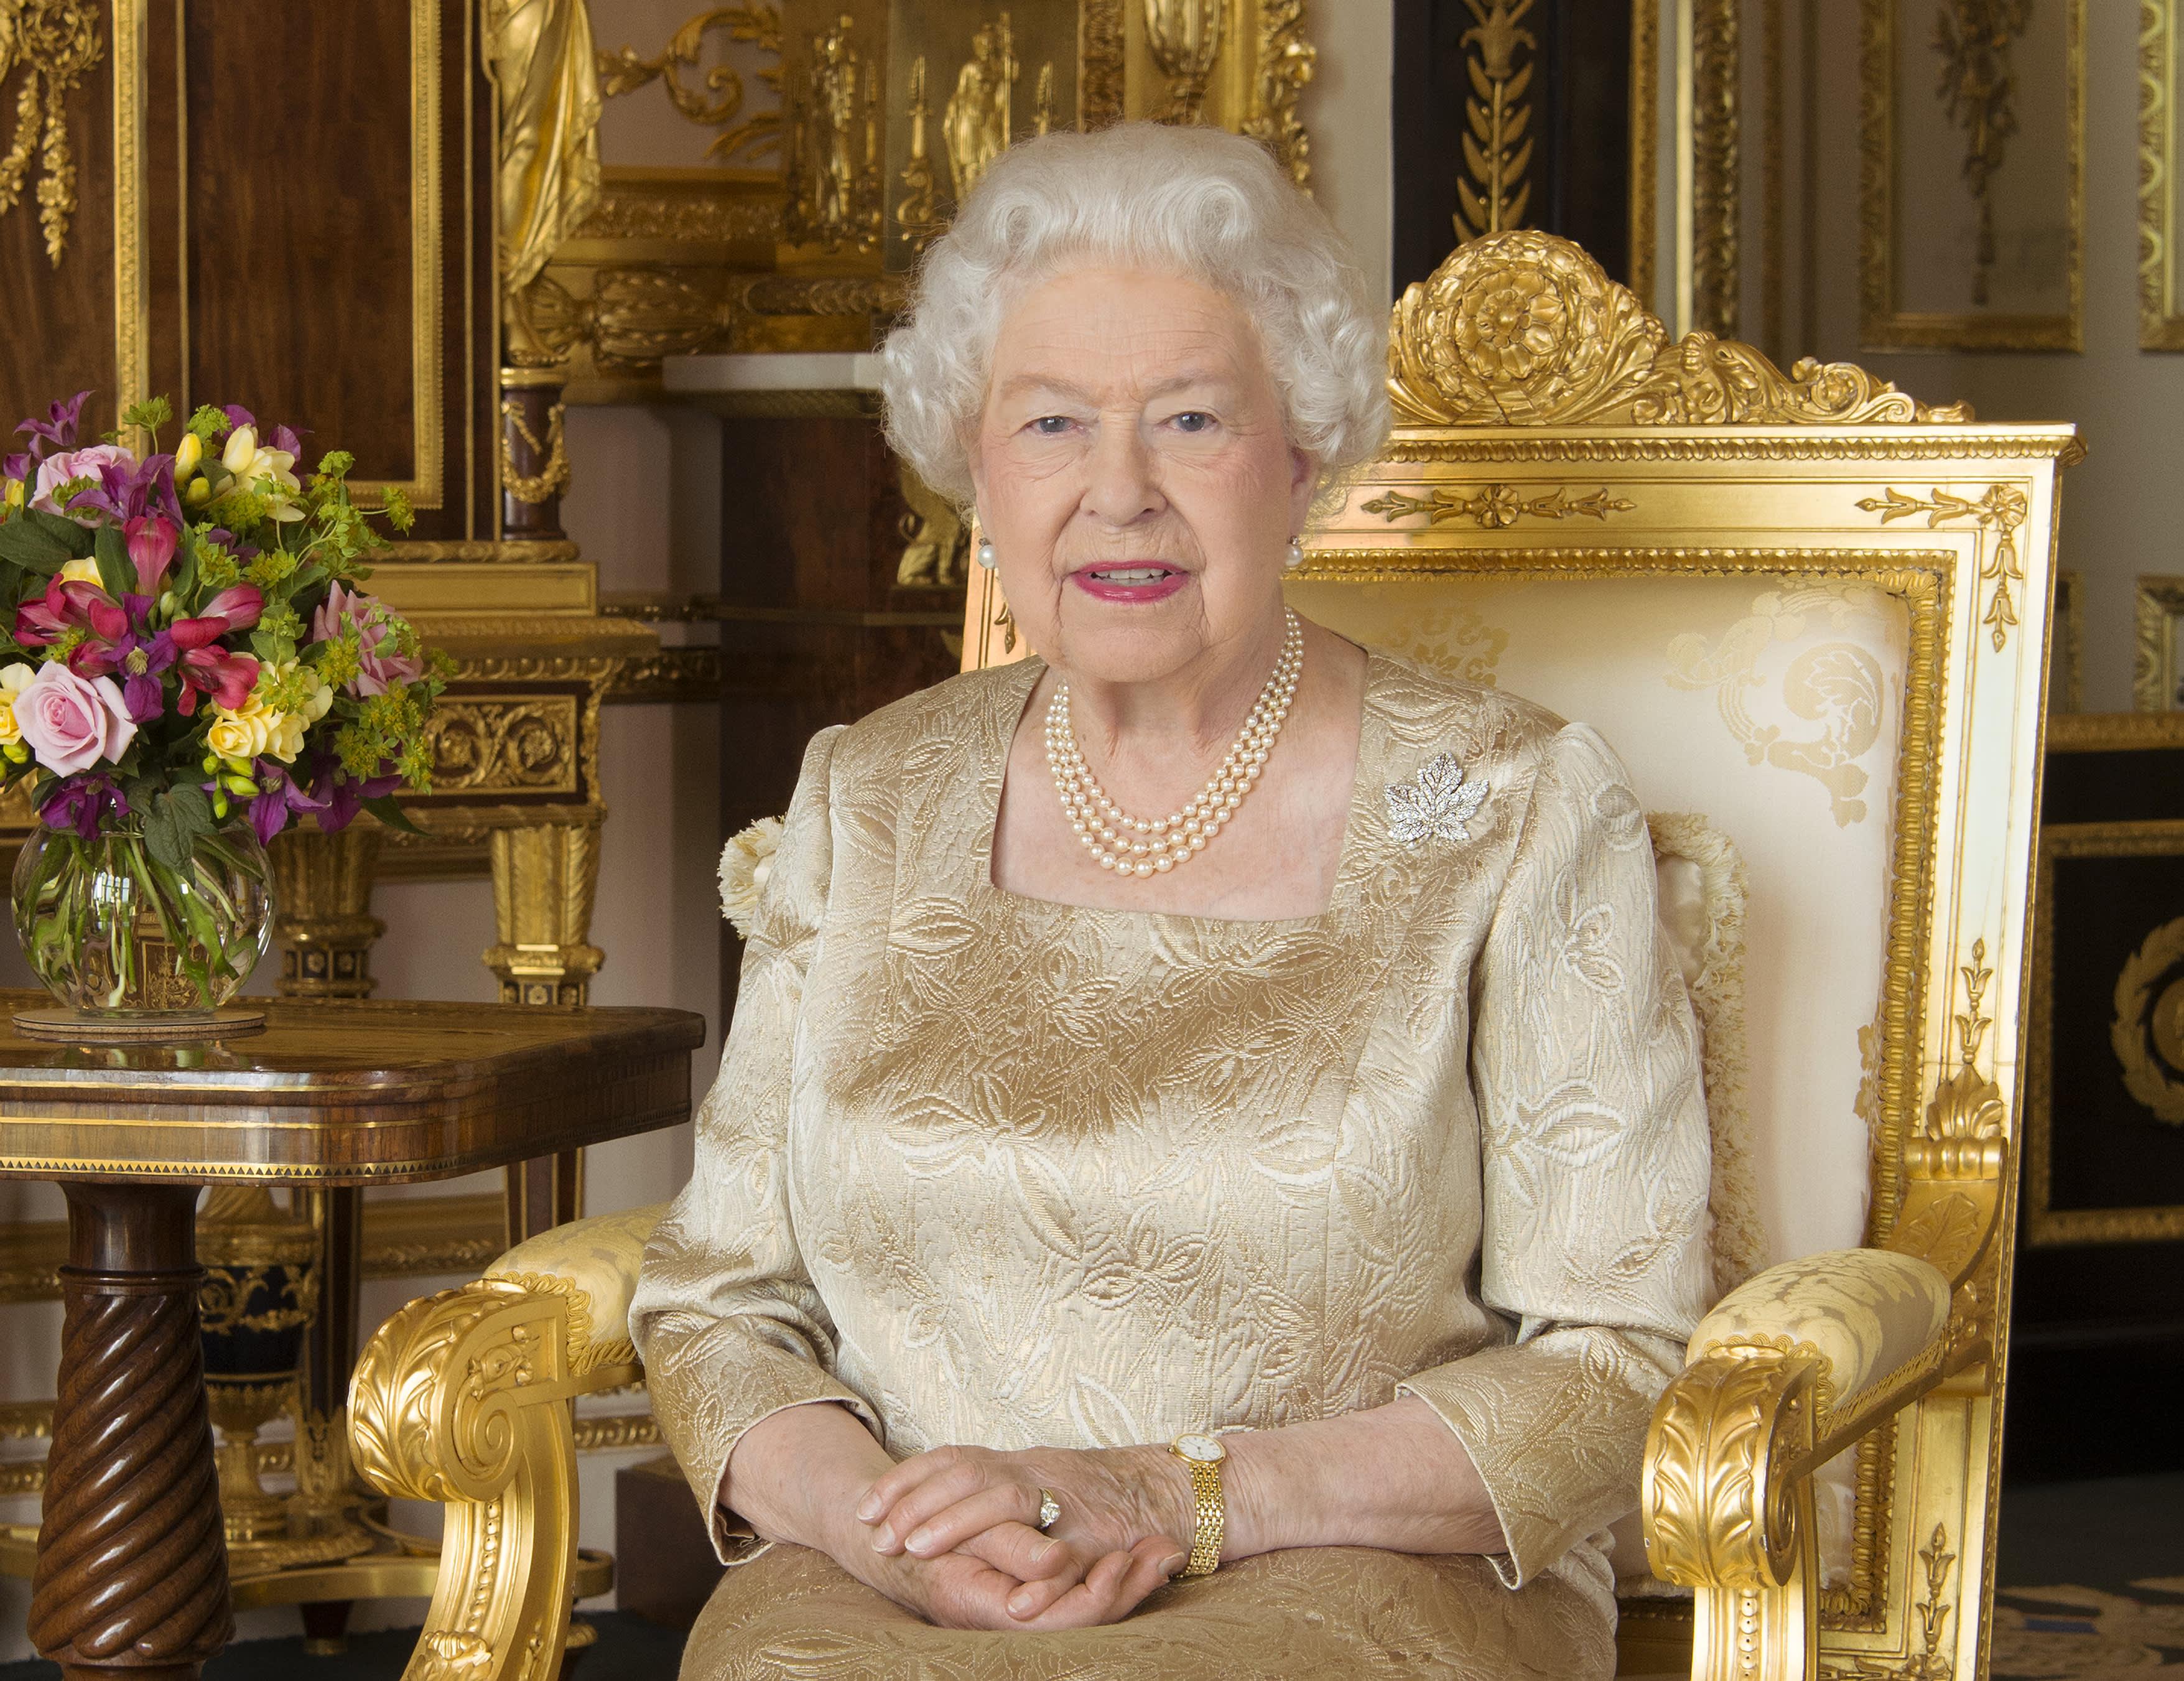 Queen Elizabeth II to admit 'bumpy' year in Christmas speech